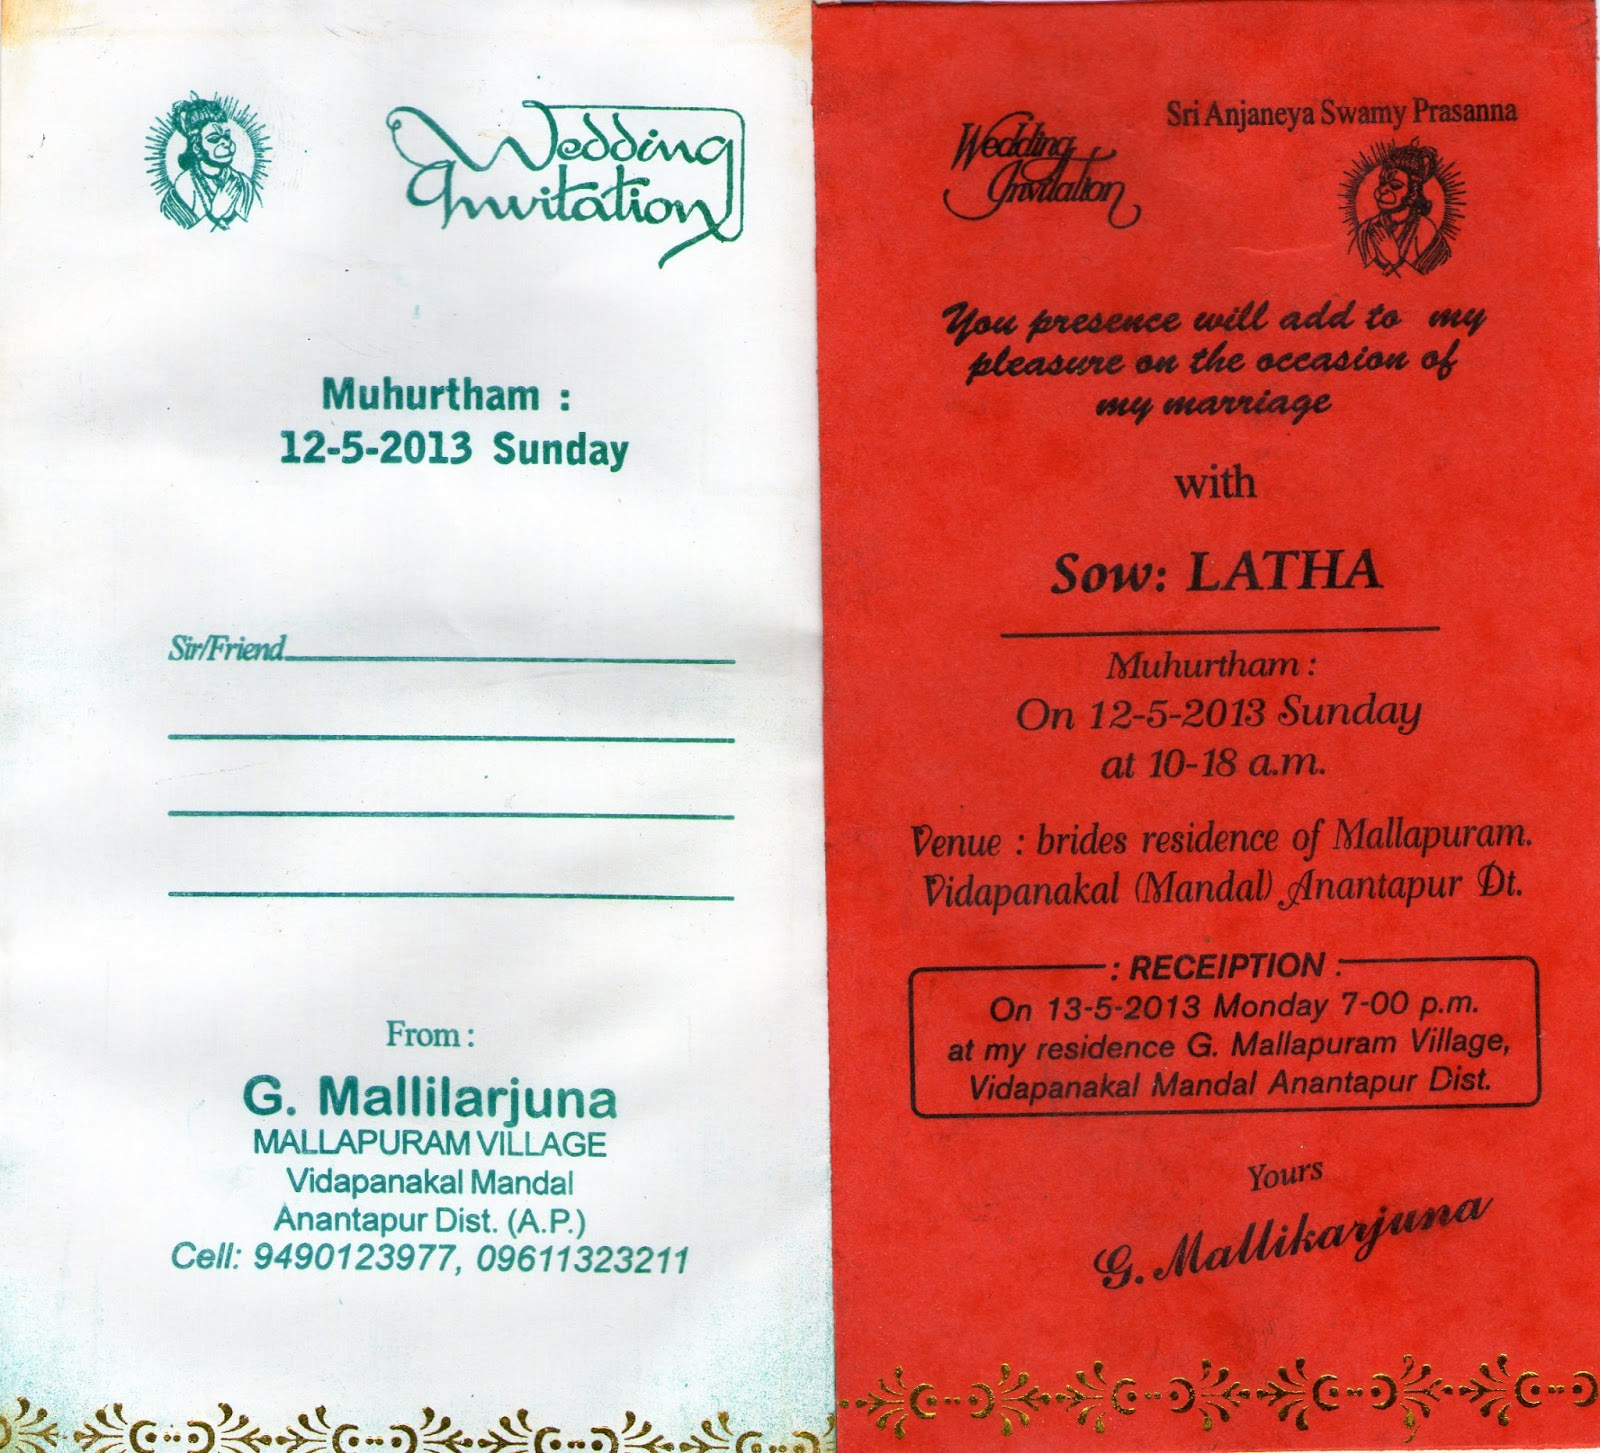 Nice Correct Etiquette For Addressing Wedding Invitations Image ...